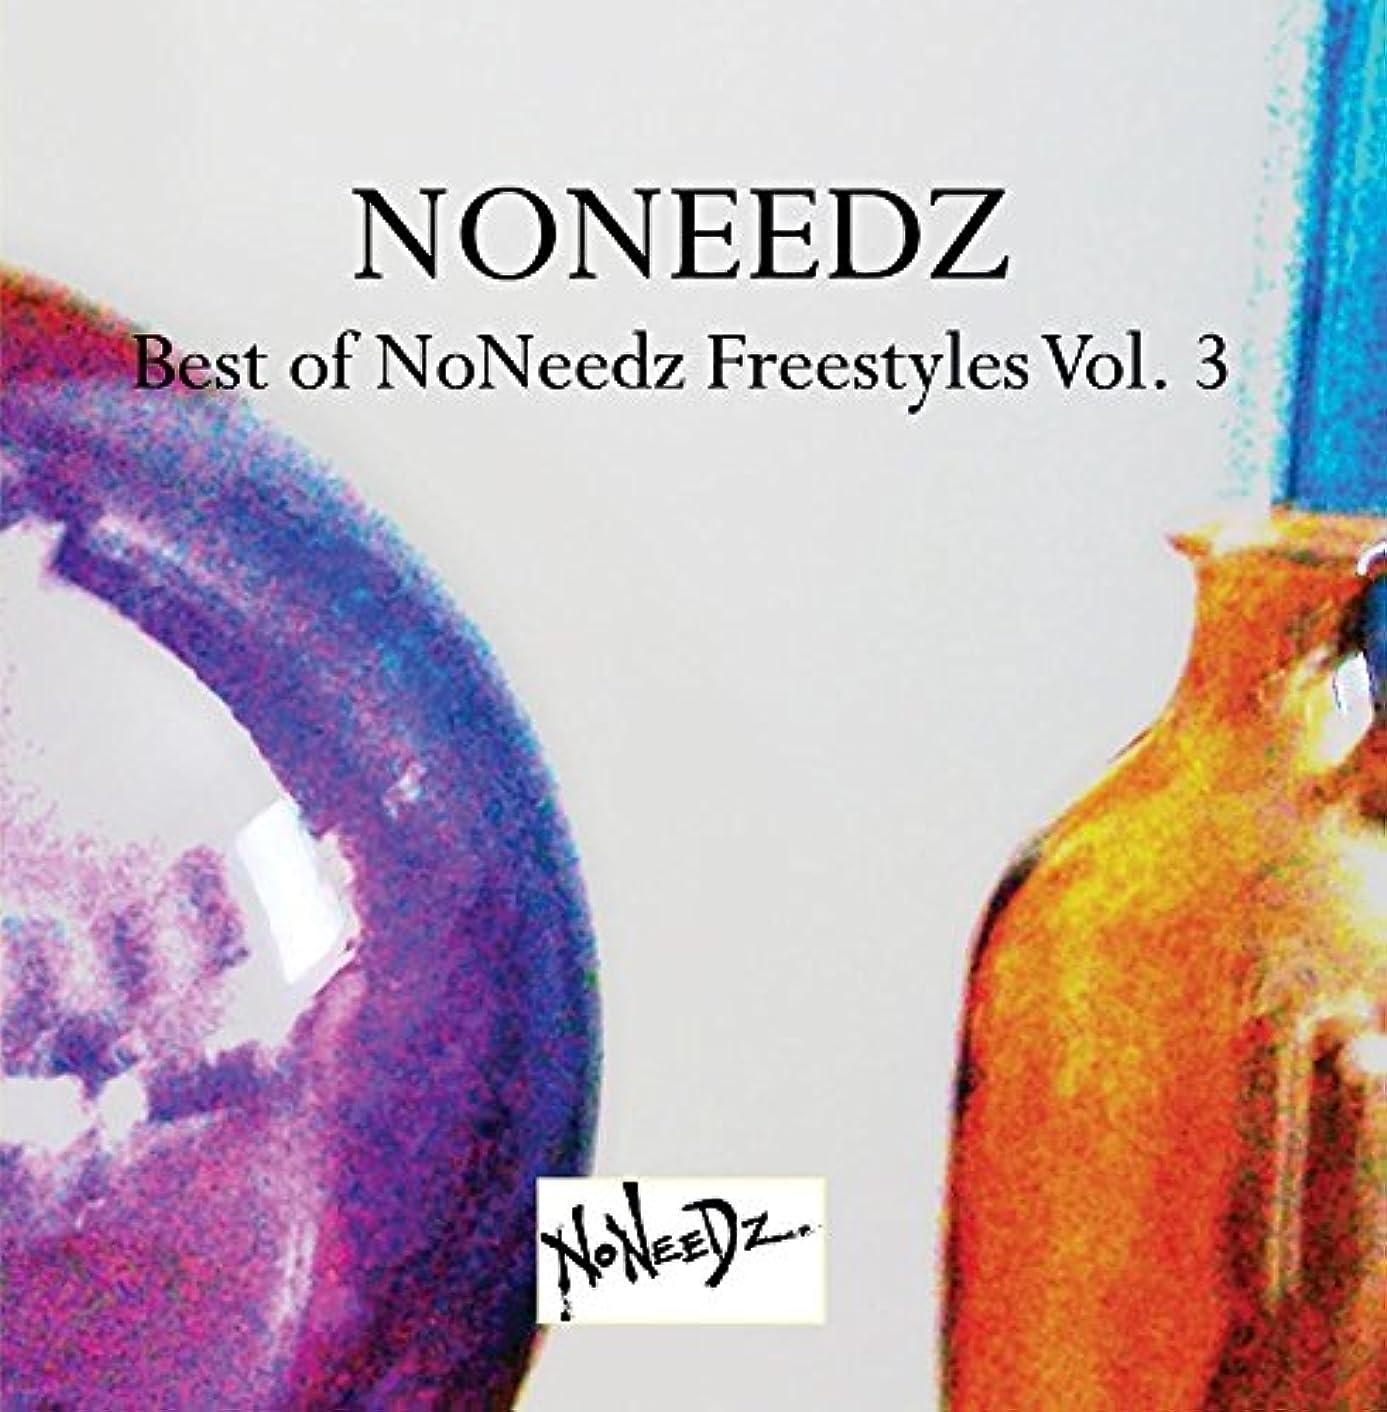 Best of NoNeedz Freestyles Vol. 3